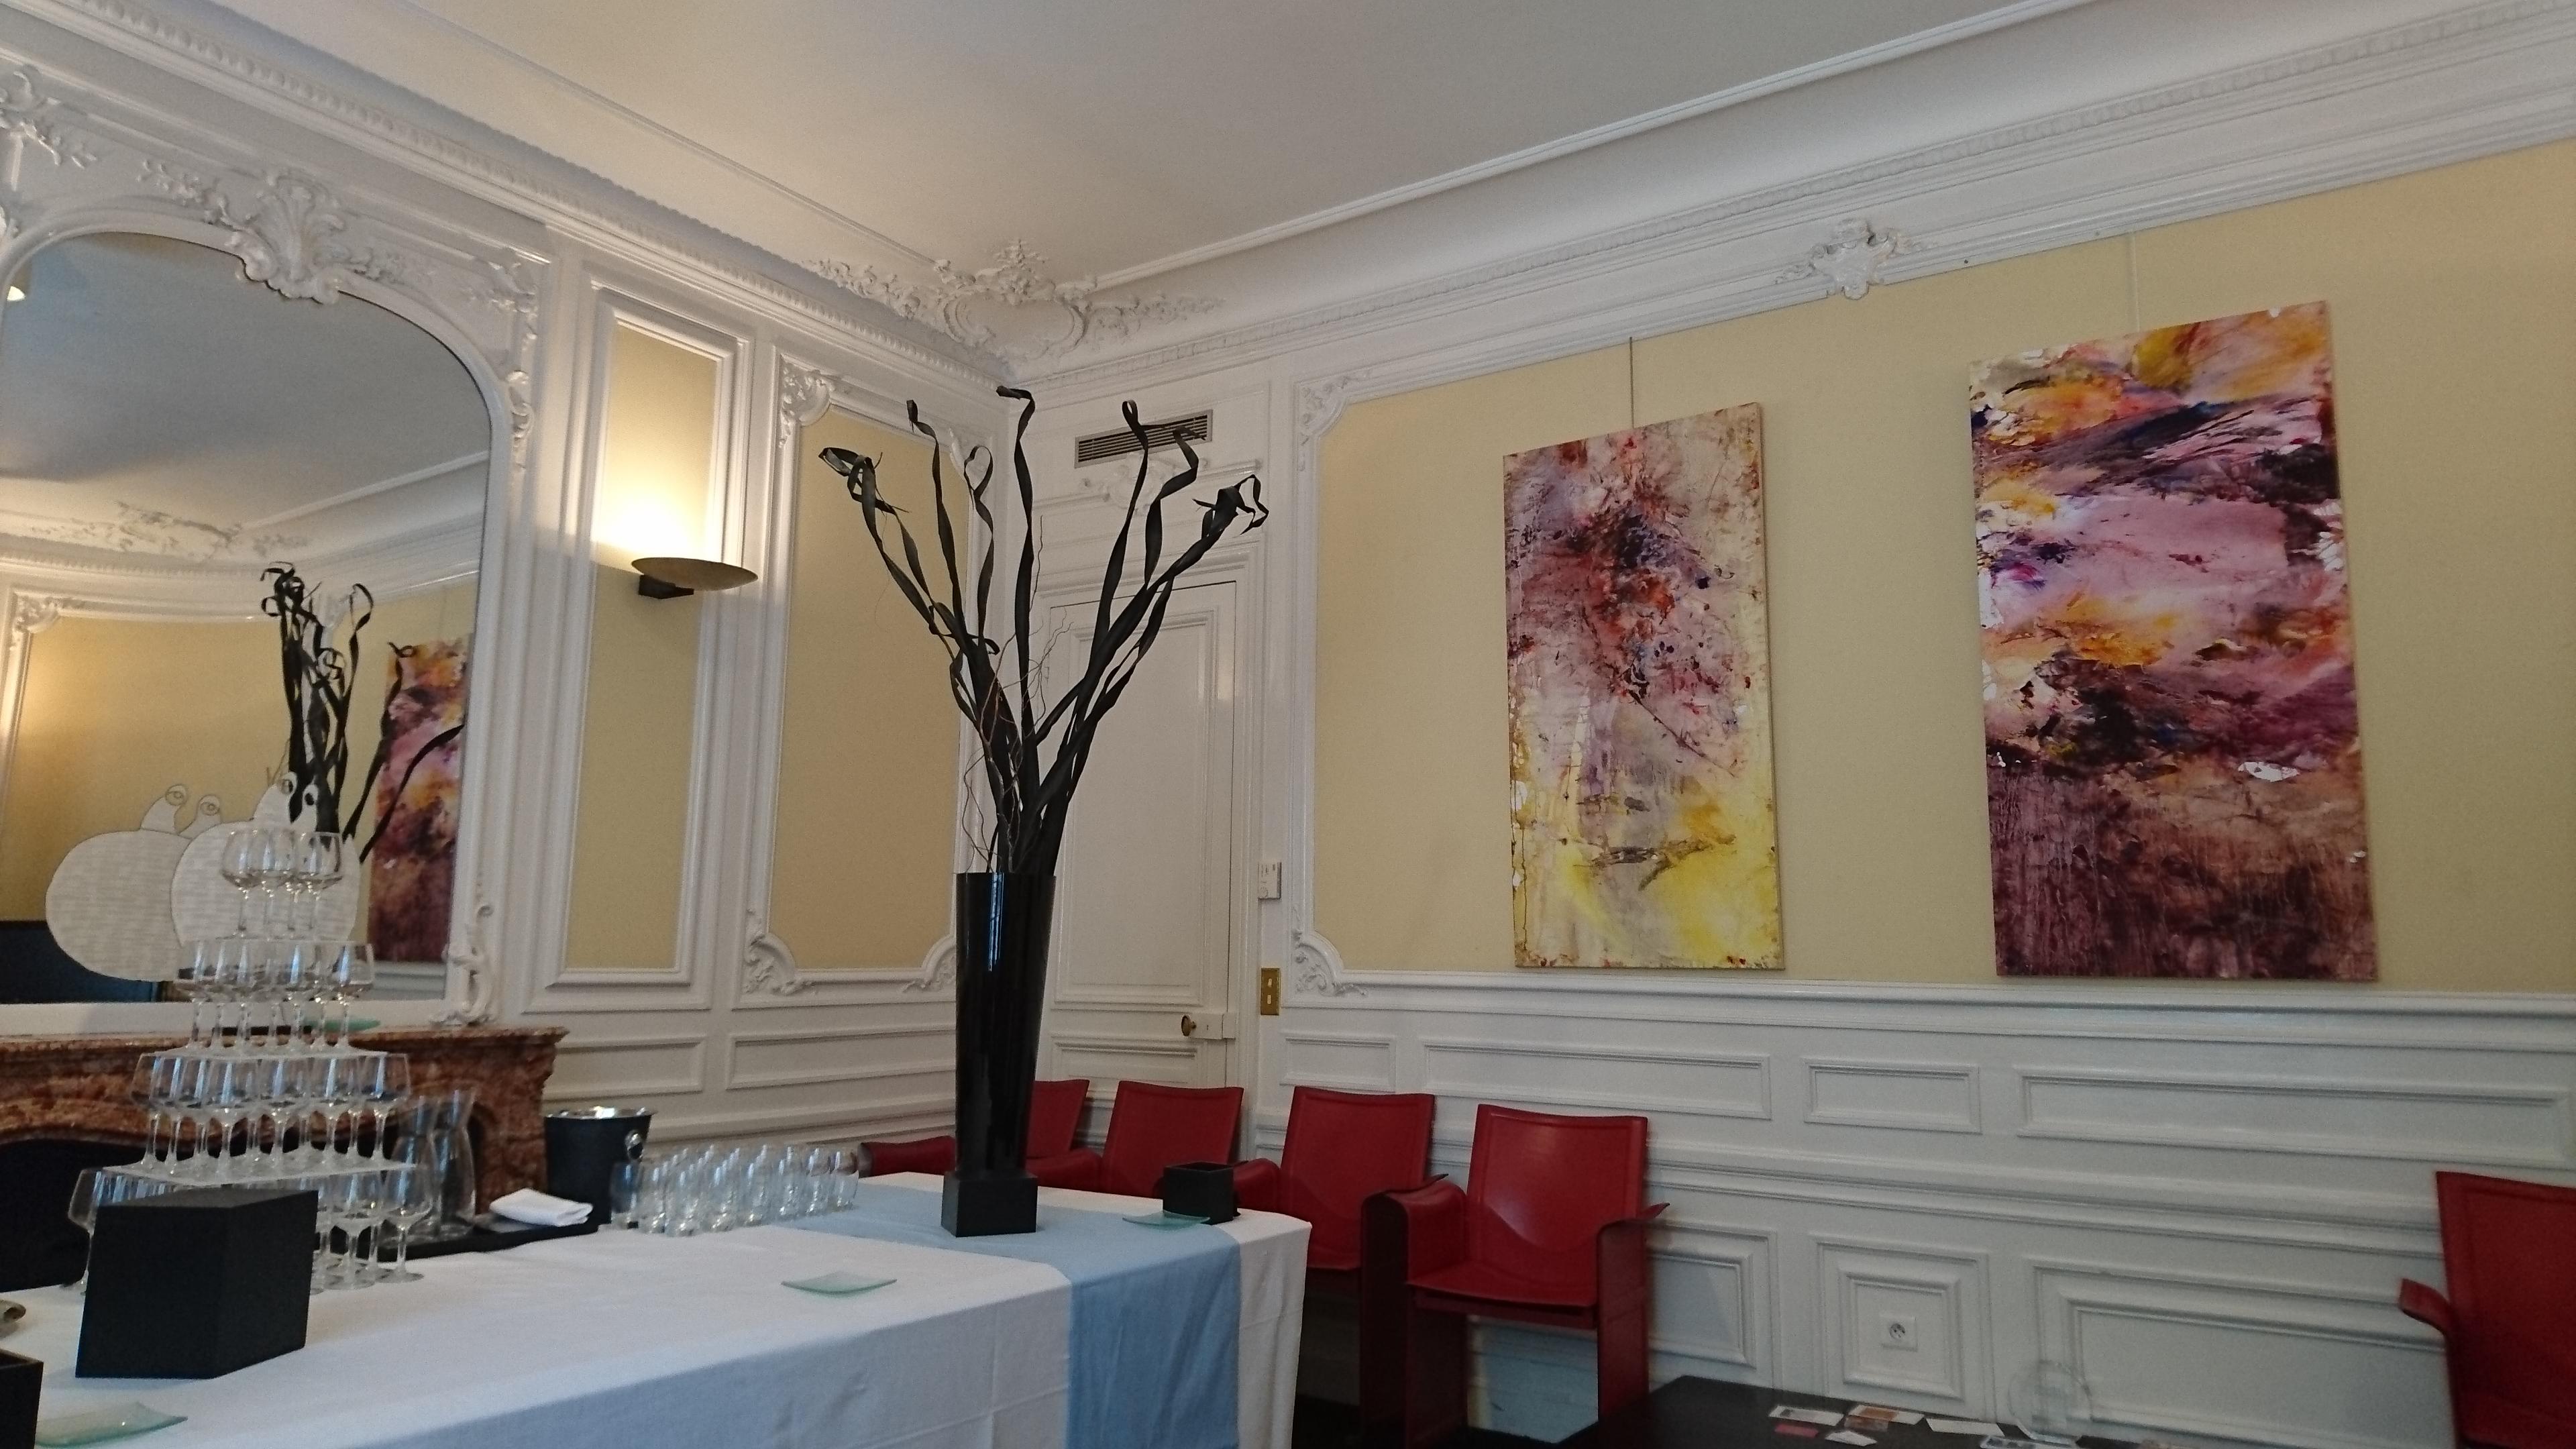 Yu Zhao, Exhibition in Barclays Bank, Paris, 2016